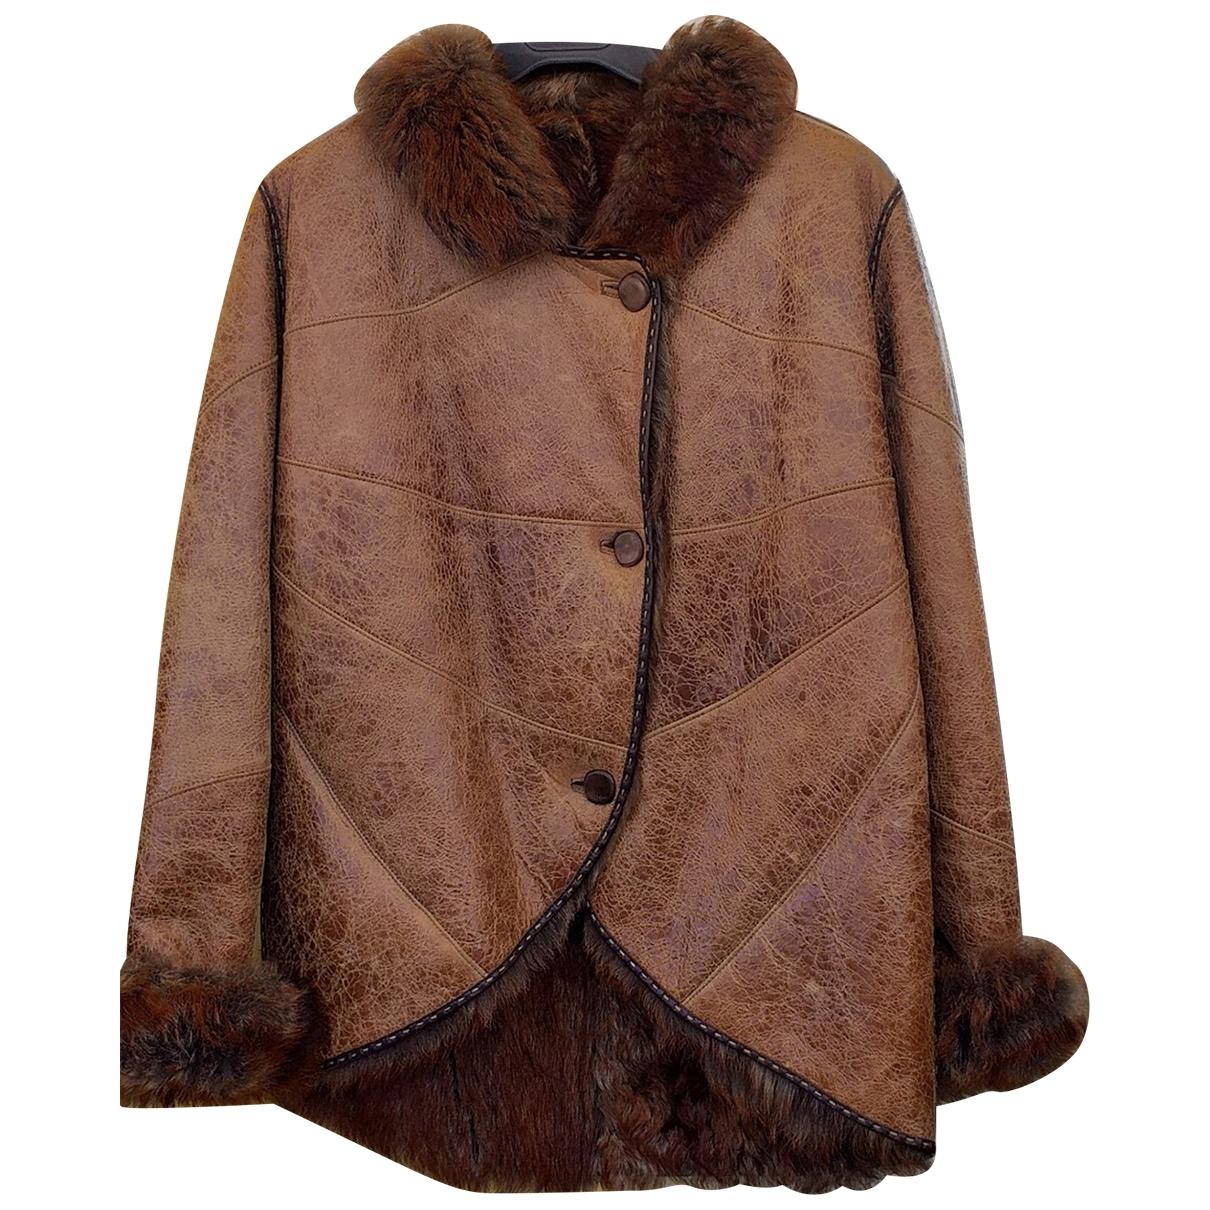 Fendi \N Brown Fur jacket for Women 36 FR